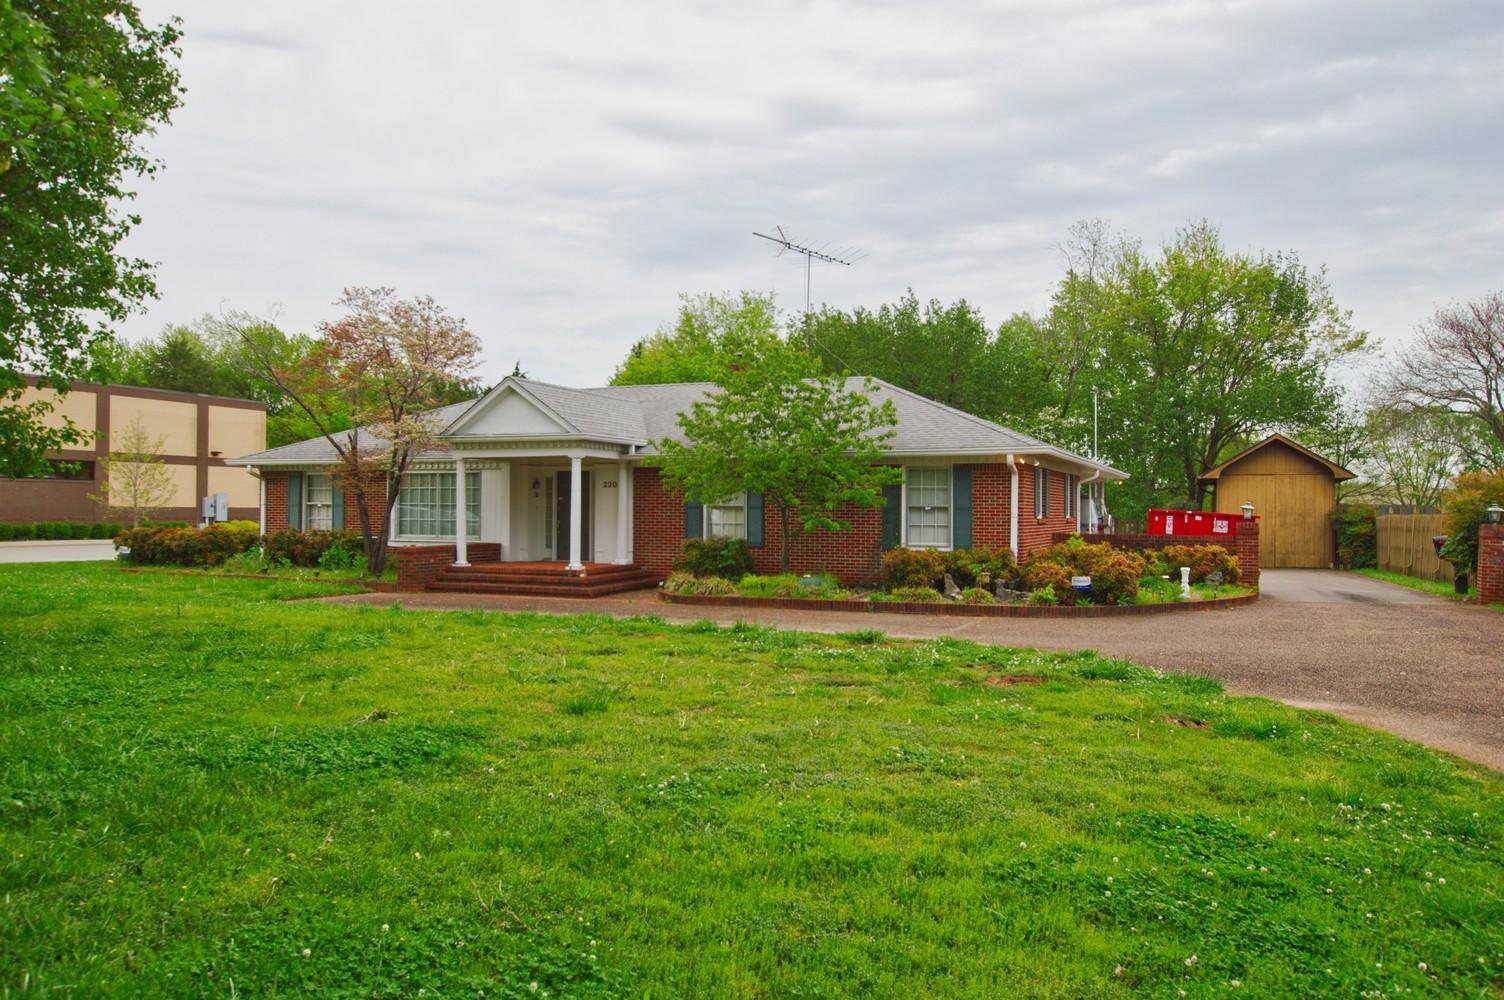 2202 Memorial Blvd Property Photo - Murfreesboro, TN real estate listing